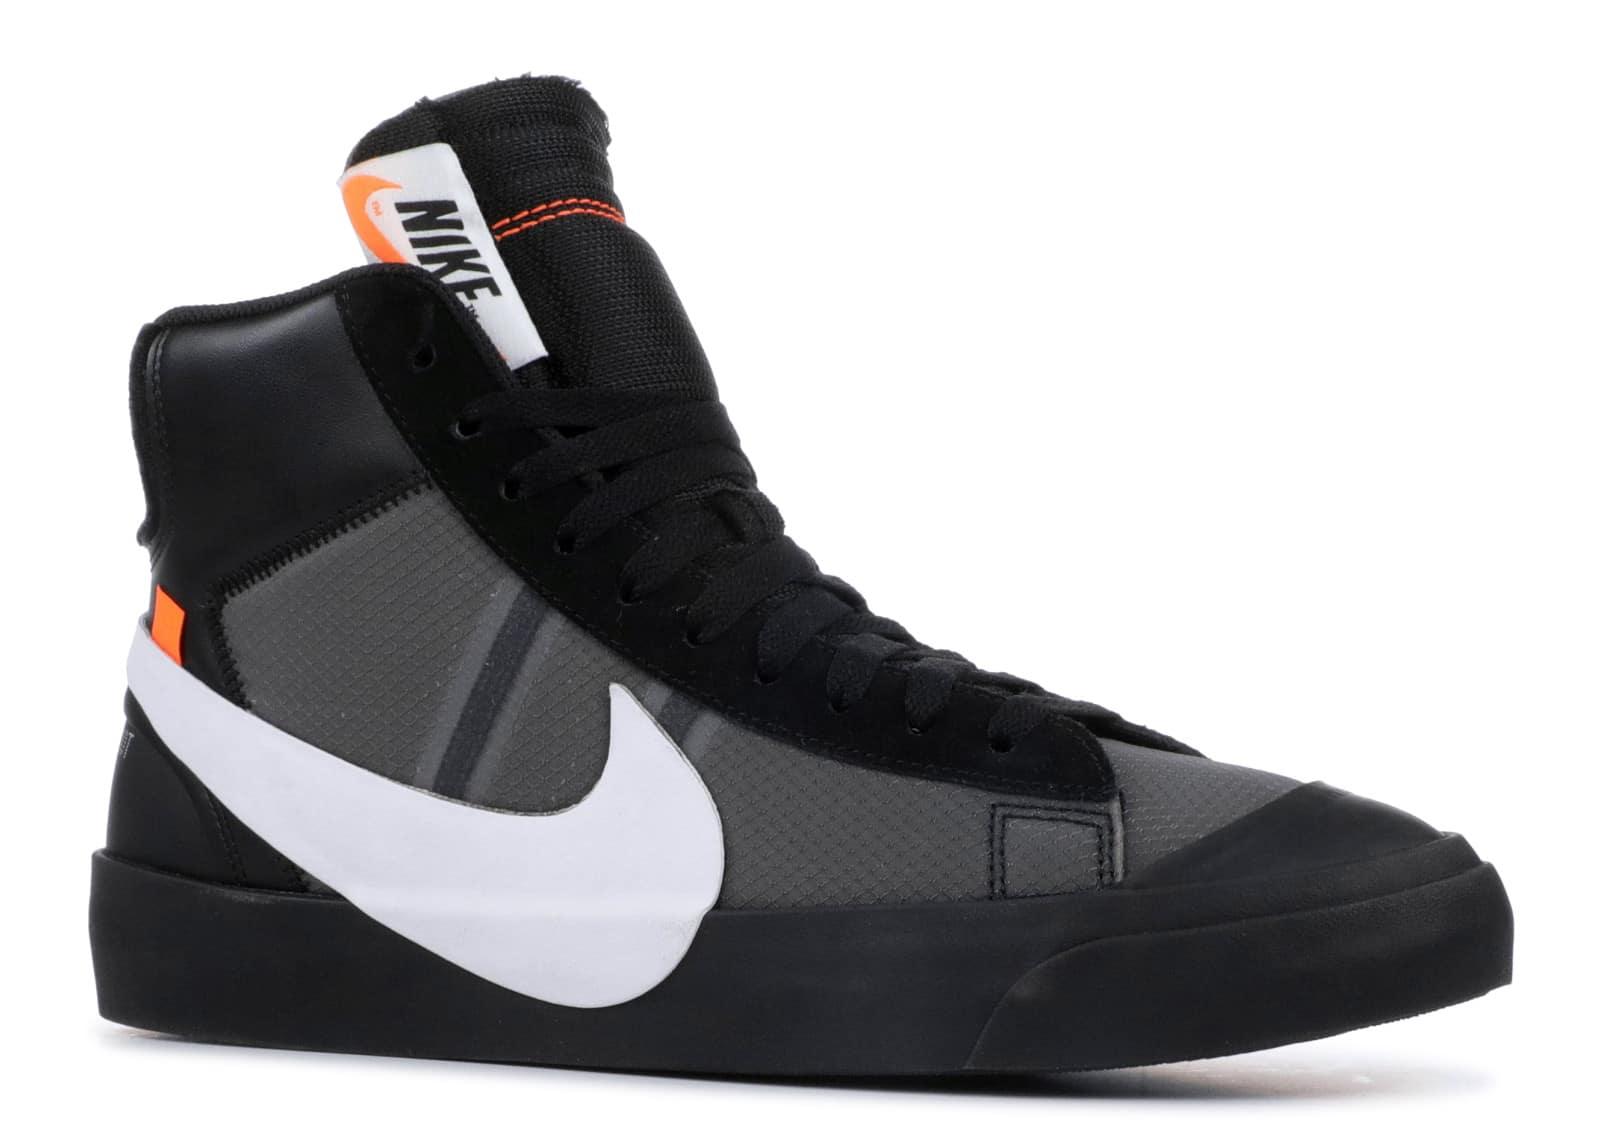 Off White Nike Blazer Mid Grim Reaper - kickstw